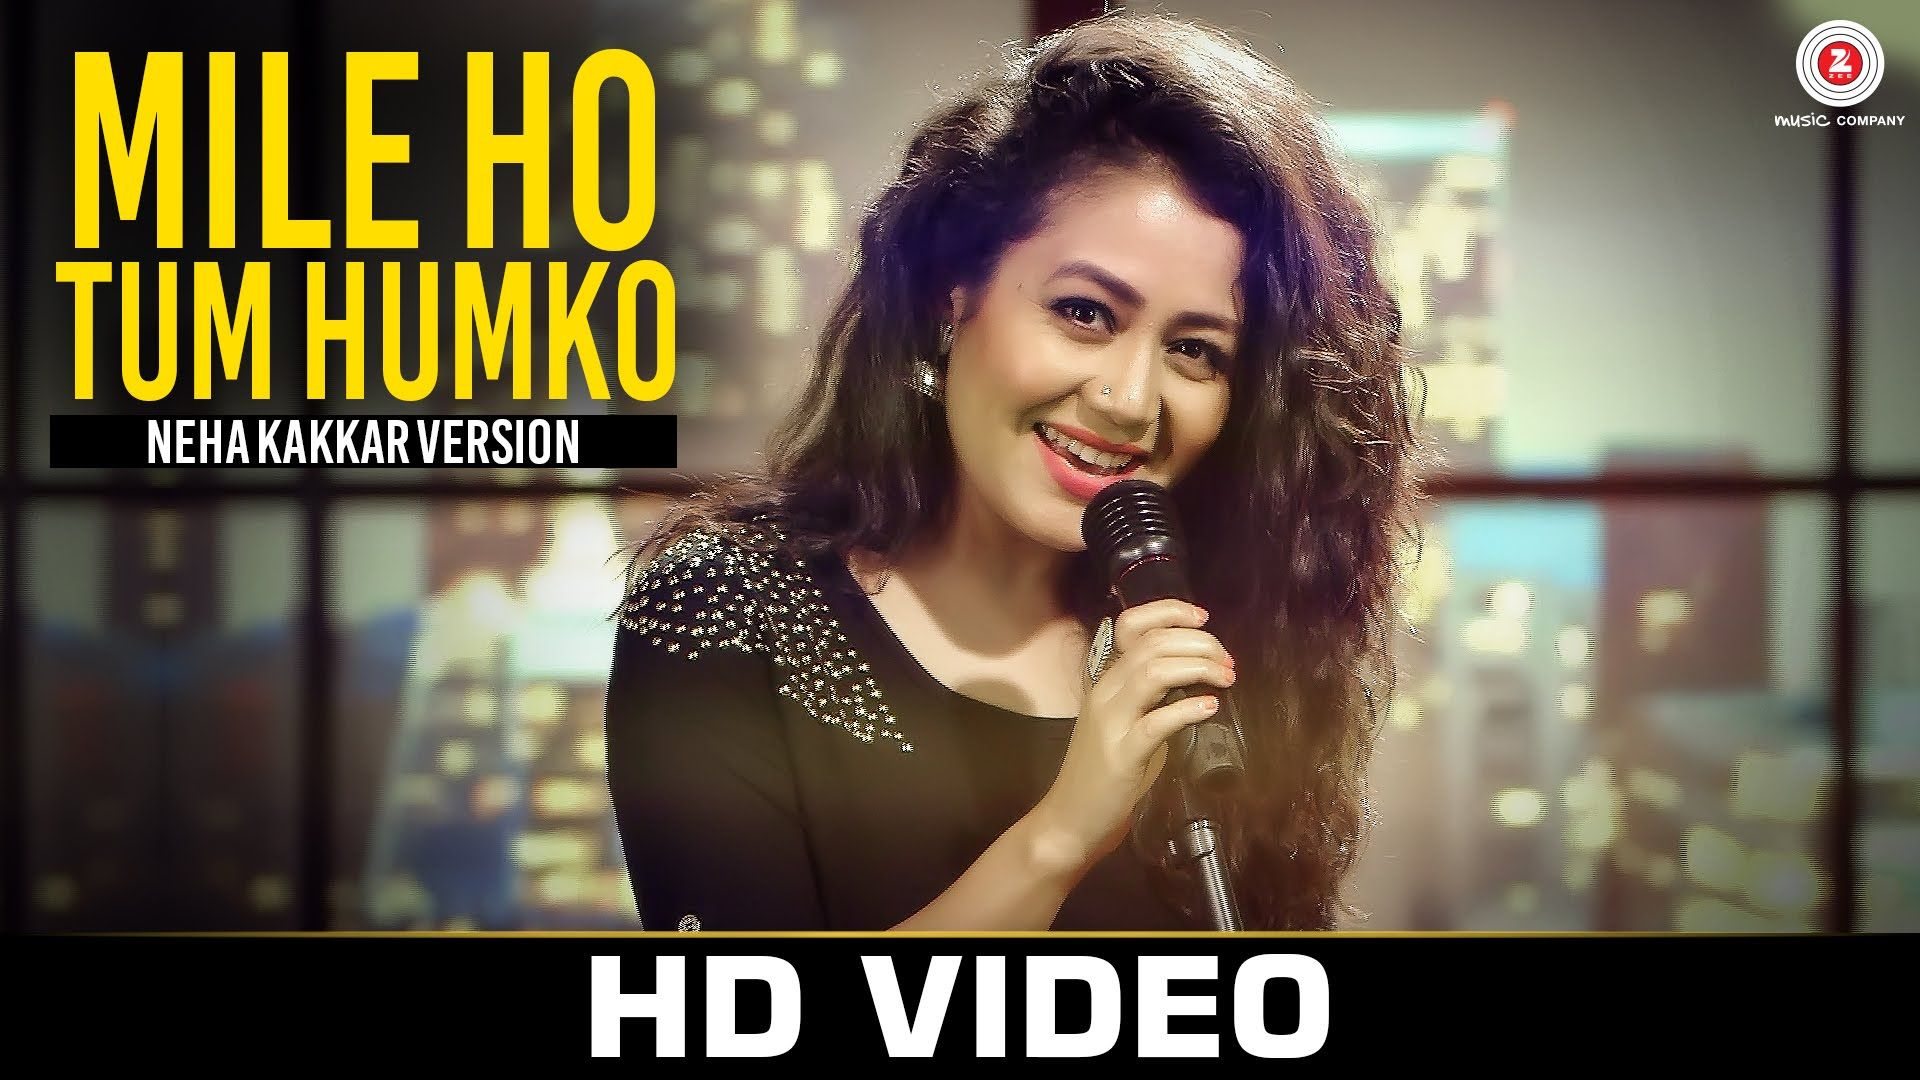 Mile Ho Tum - Neha Kakkar's Version   Tony Kakkar   Love songs ...